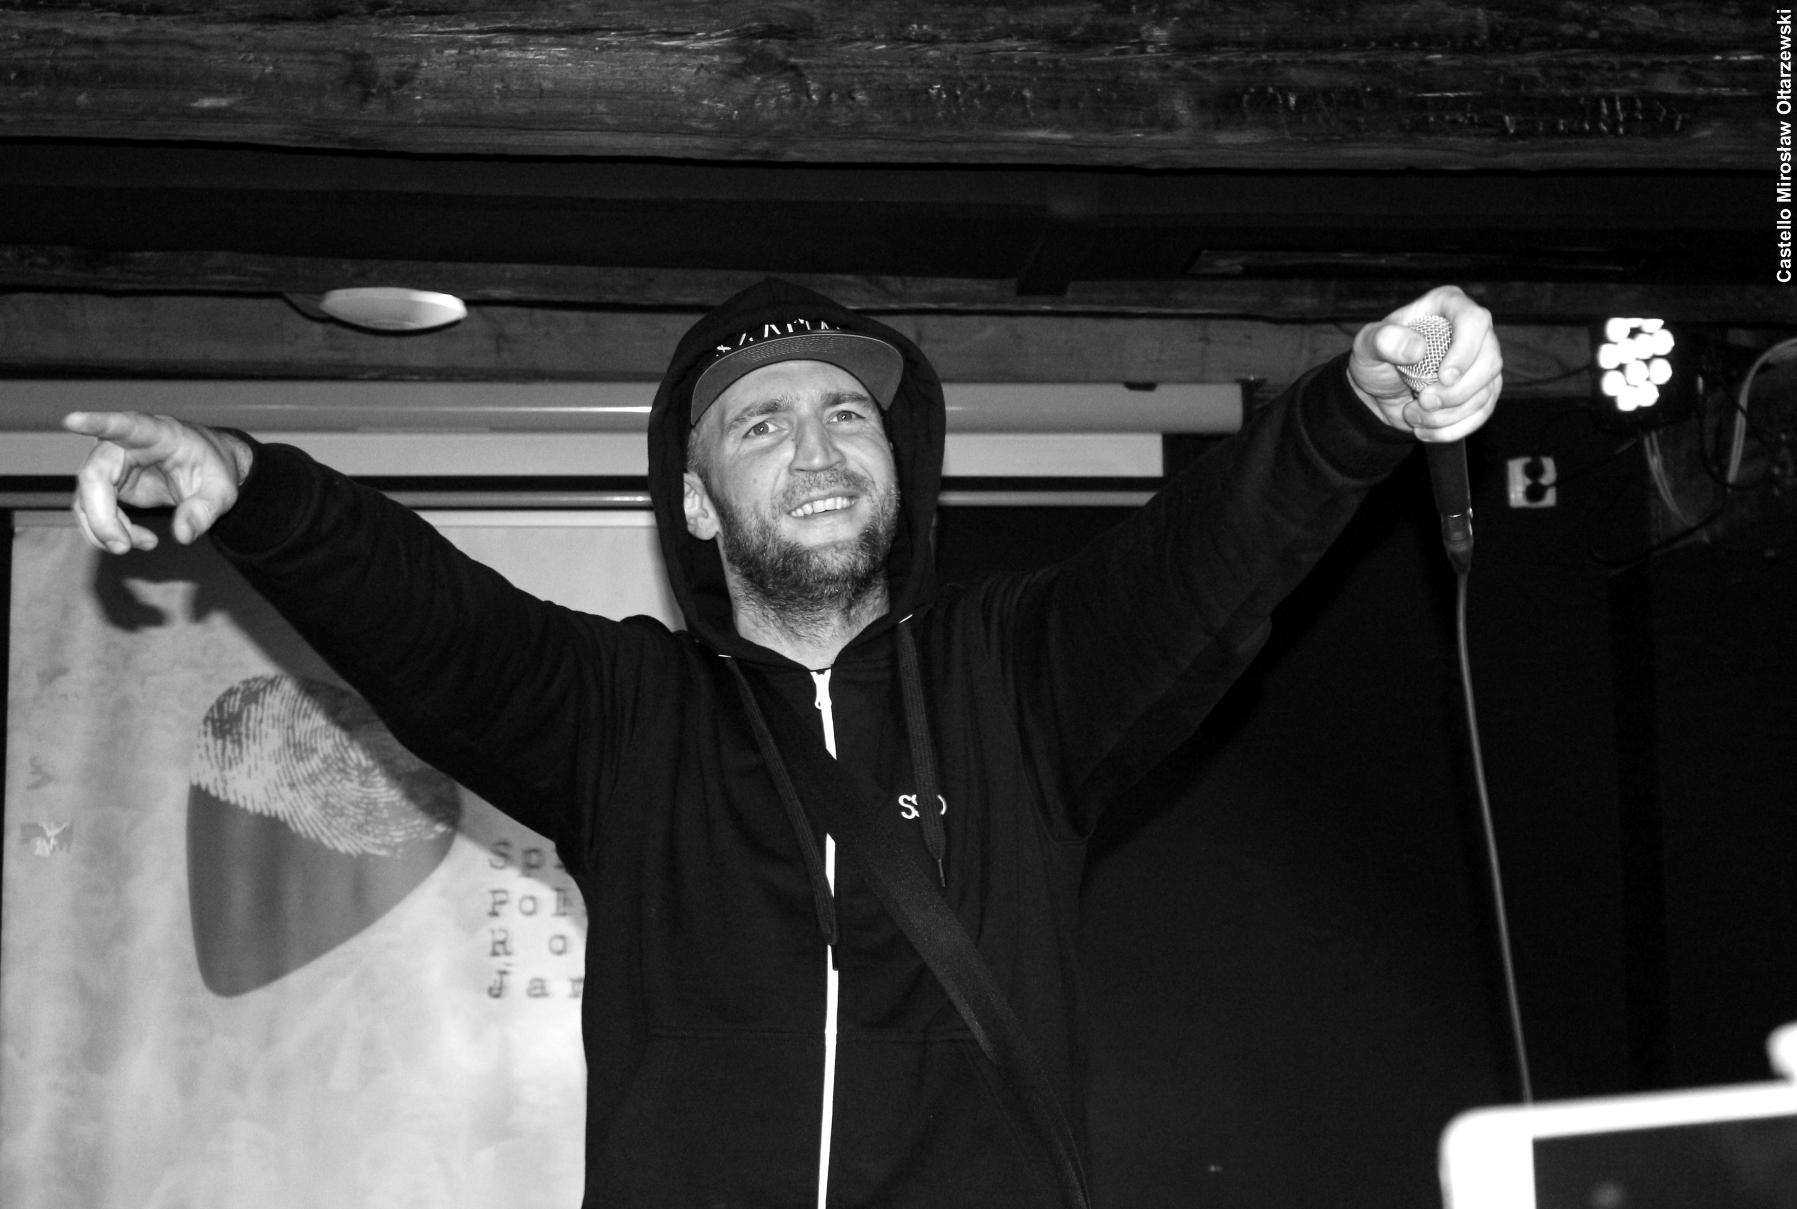 Fotorelacja z koncertu: Stahoo/ DJ HWC/ Marlena Patynko/ MTJ&BILAT